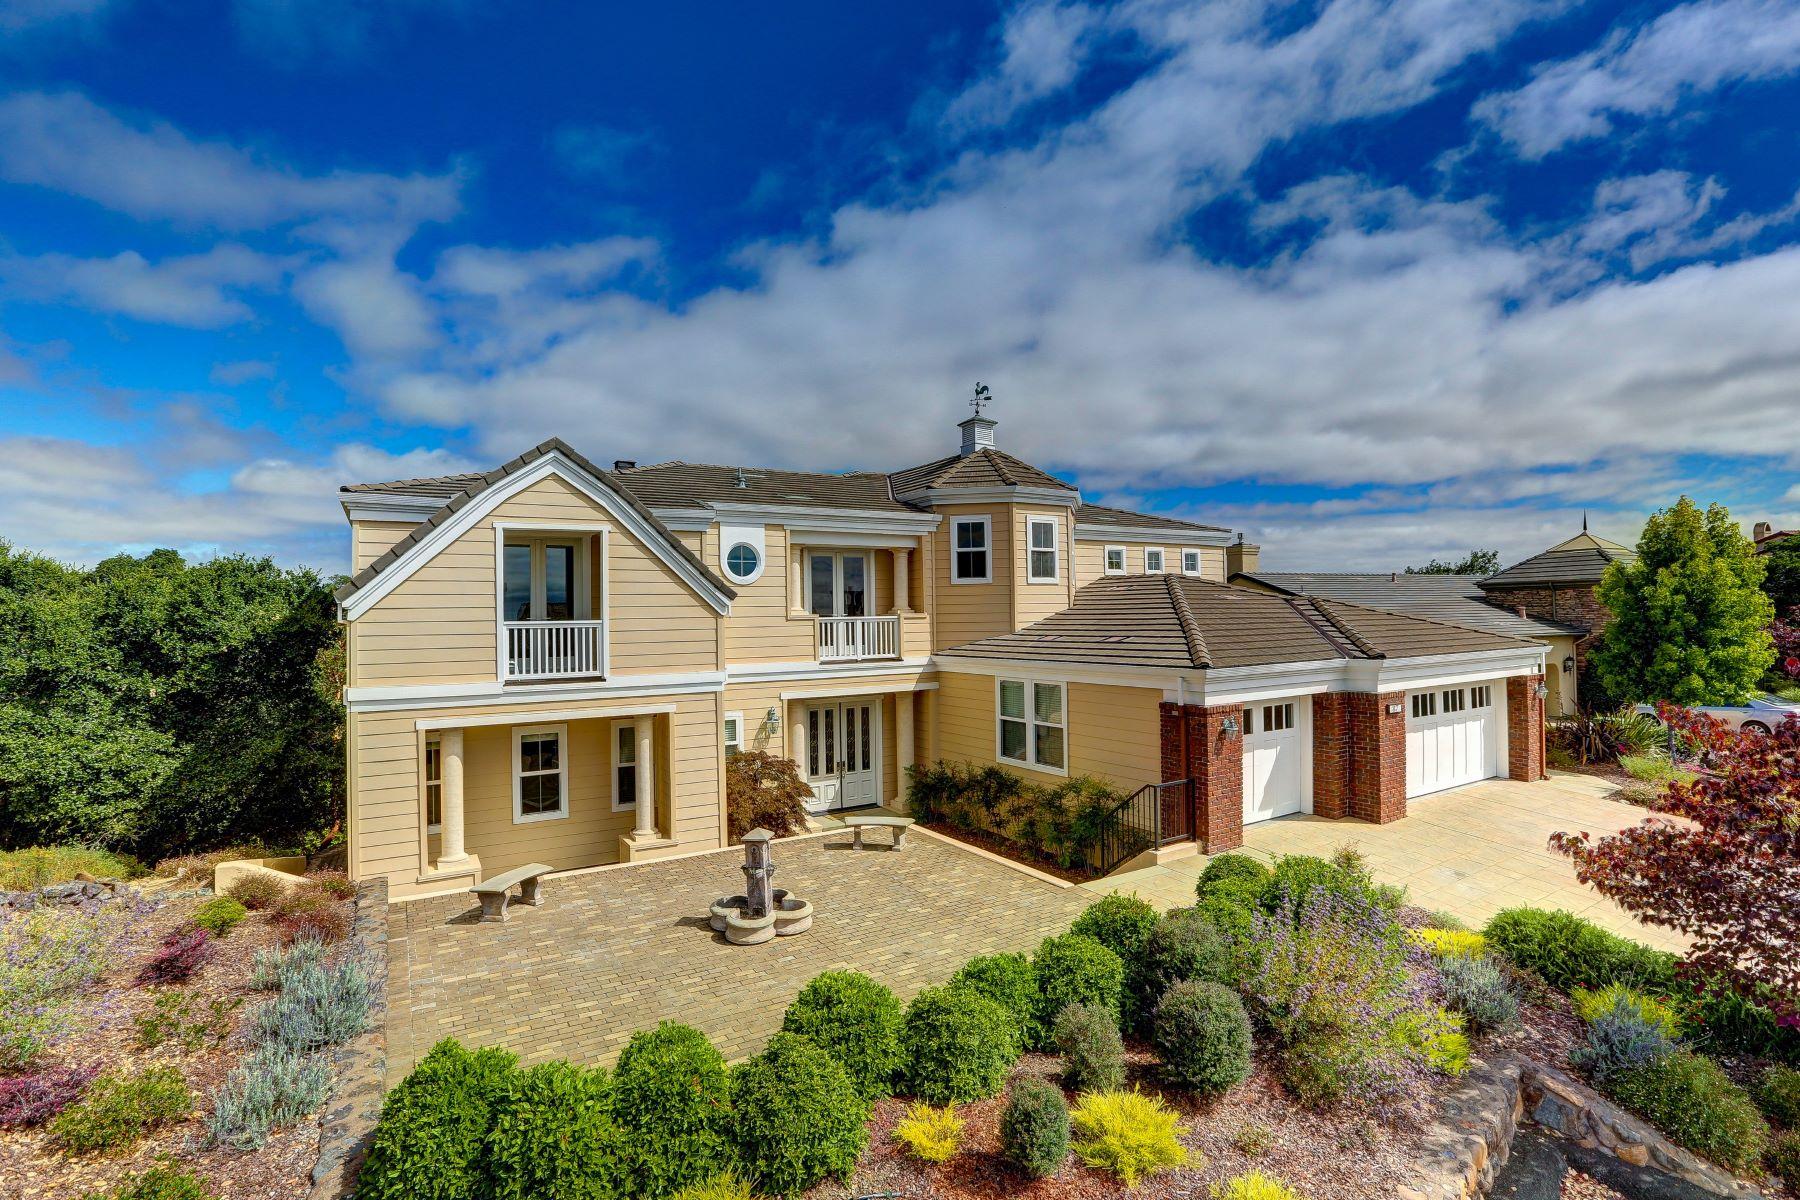 واحد منزل الأسرة للـ Sale في Bay Club Stonetree Golf Property 87 Stonetree Novato, California 94945 United States